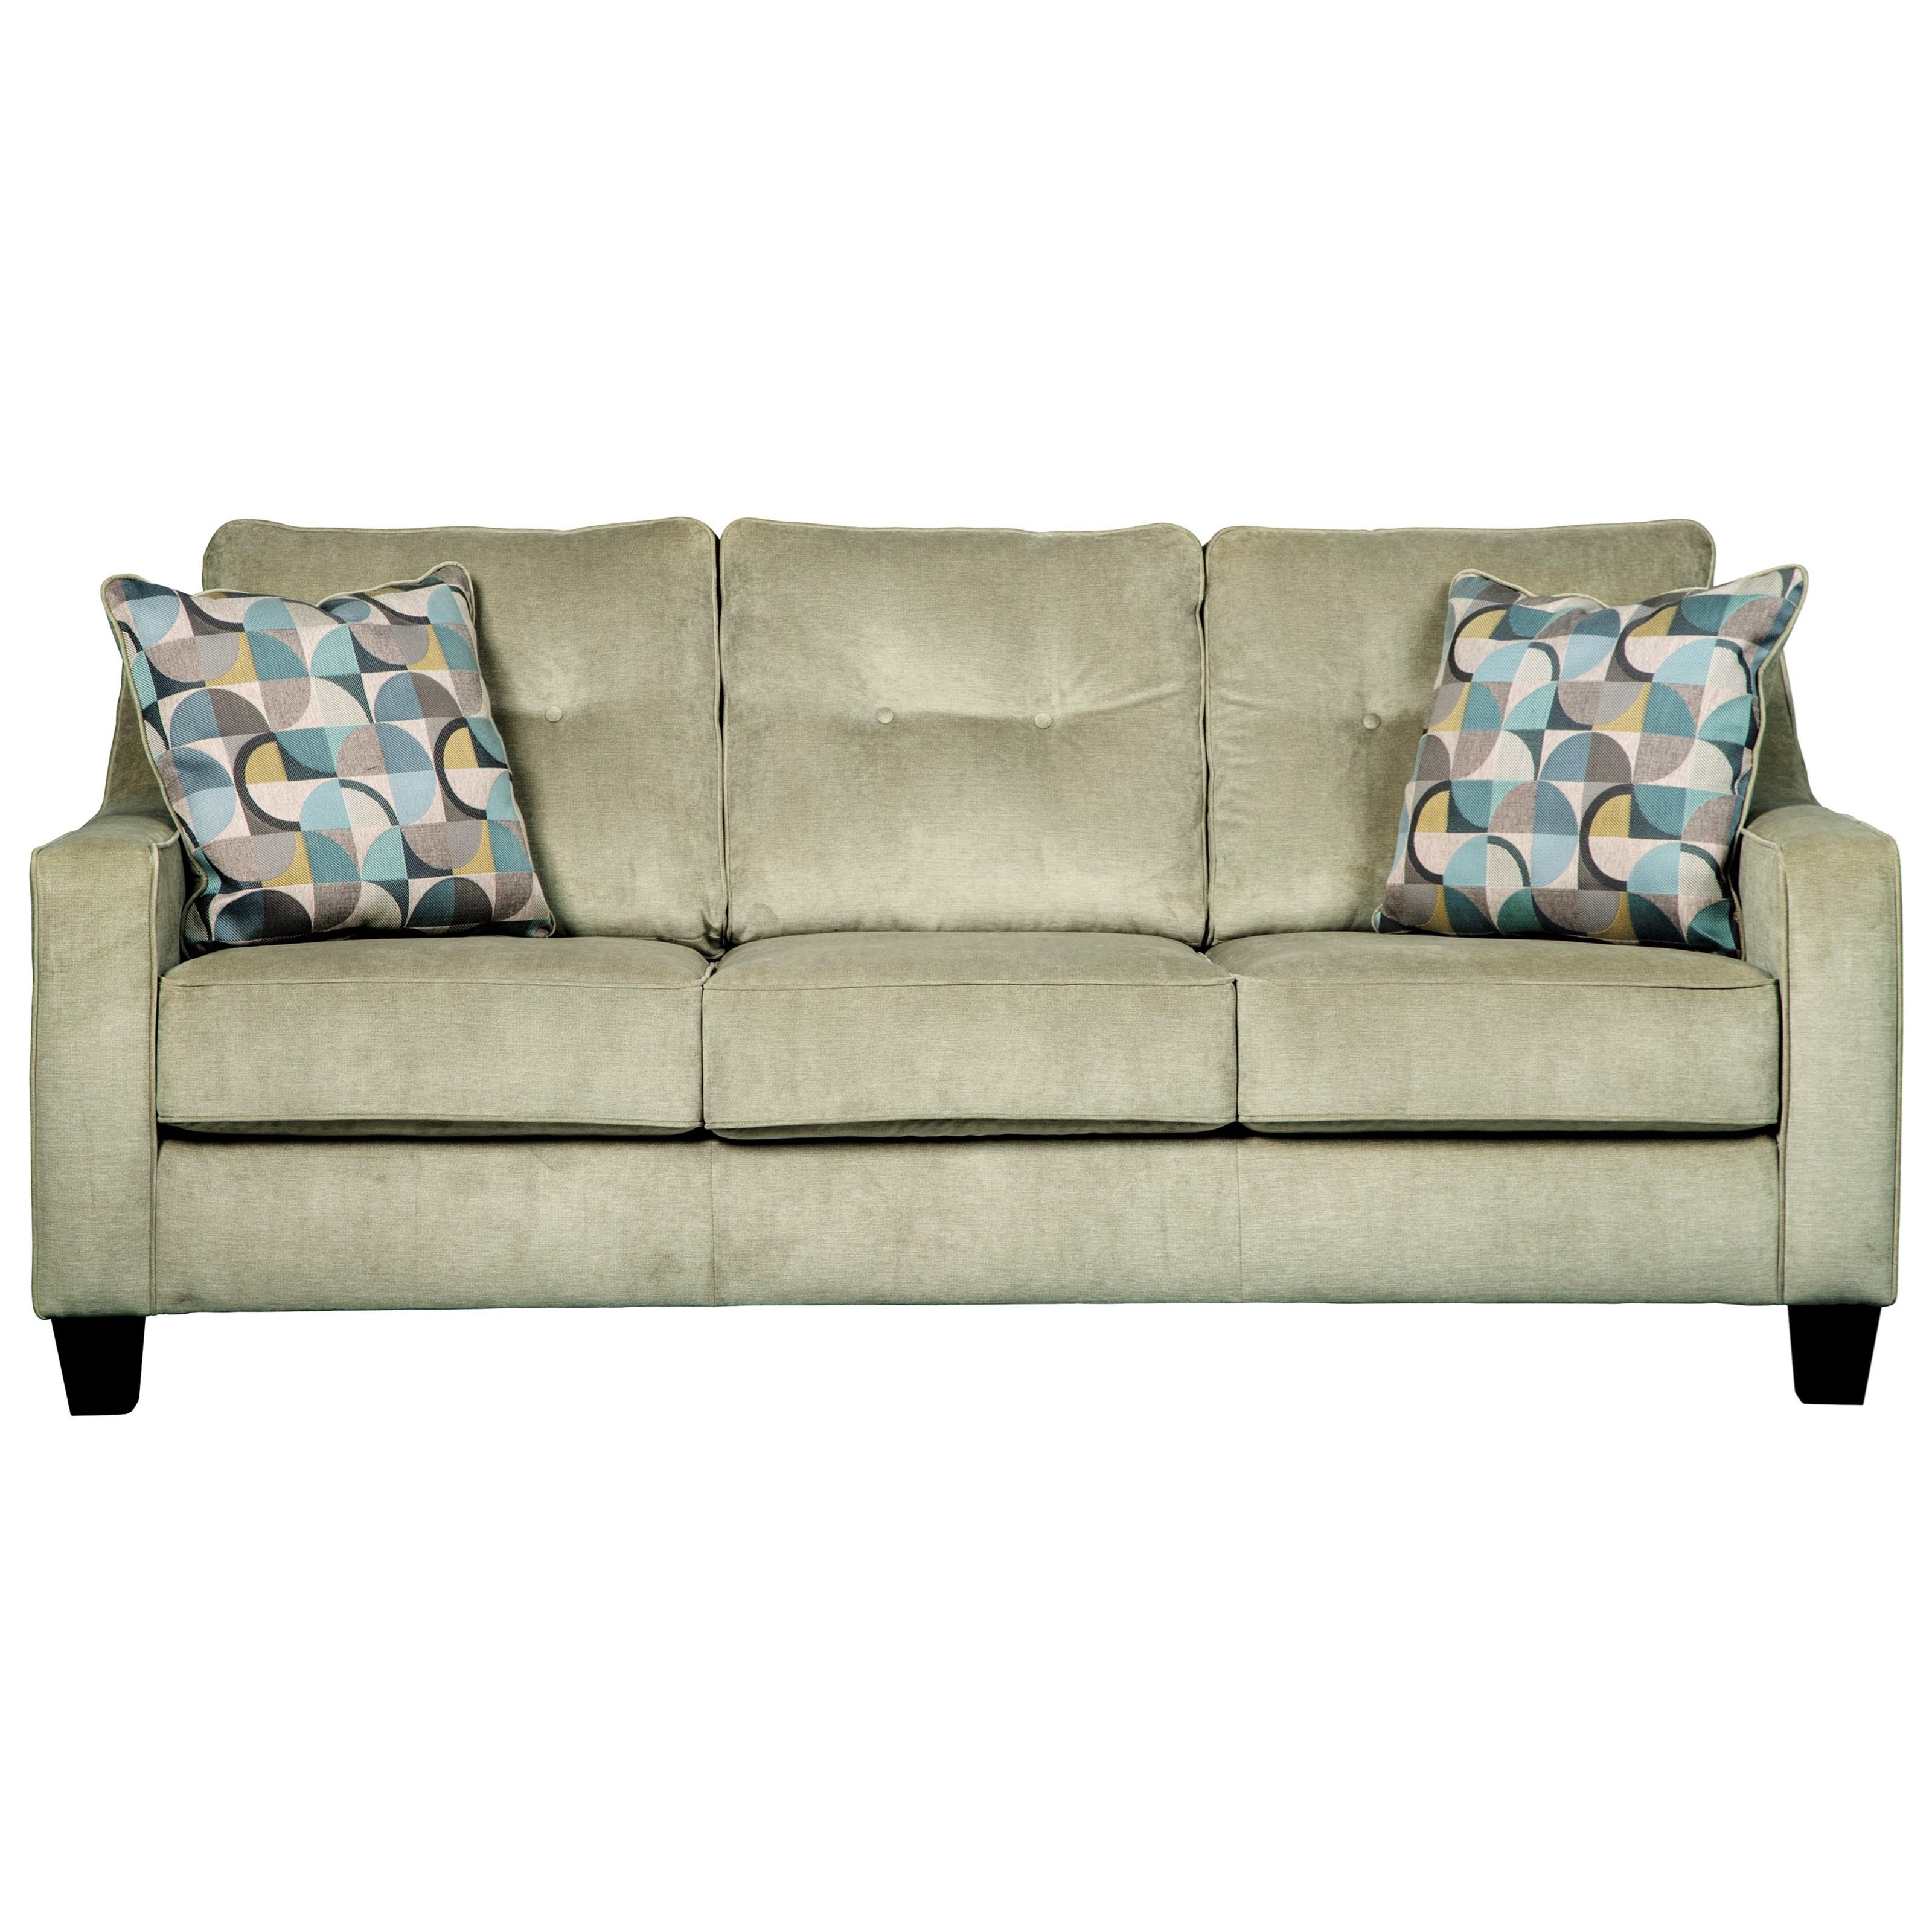 Benchcraft By Ashley Bizzy Sofa   Item Number: 6950238